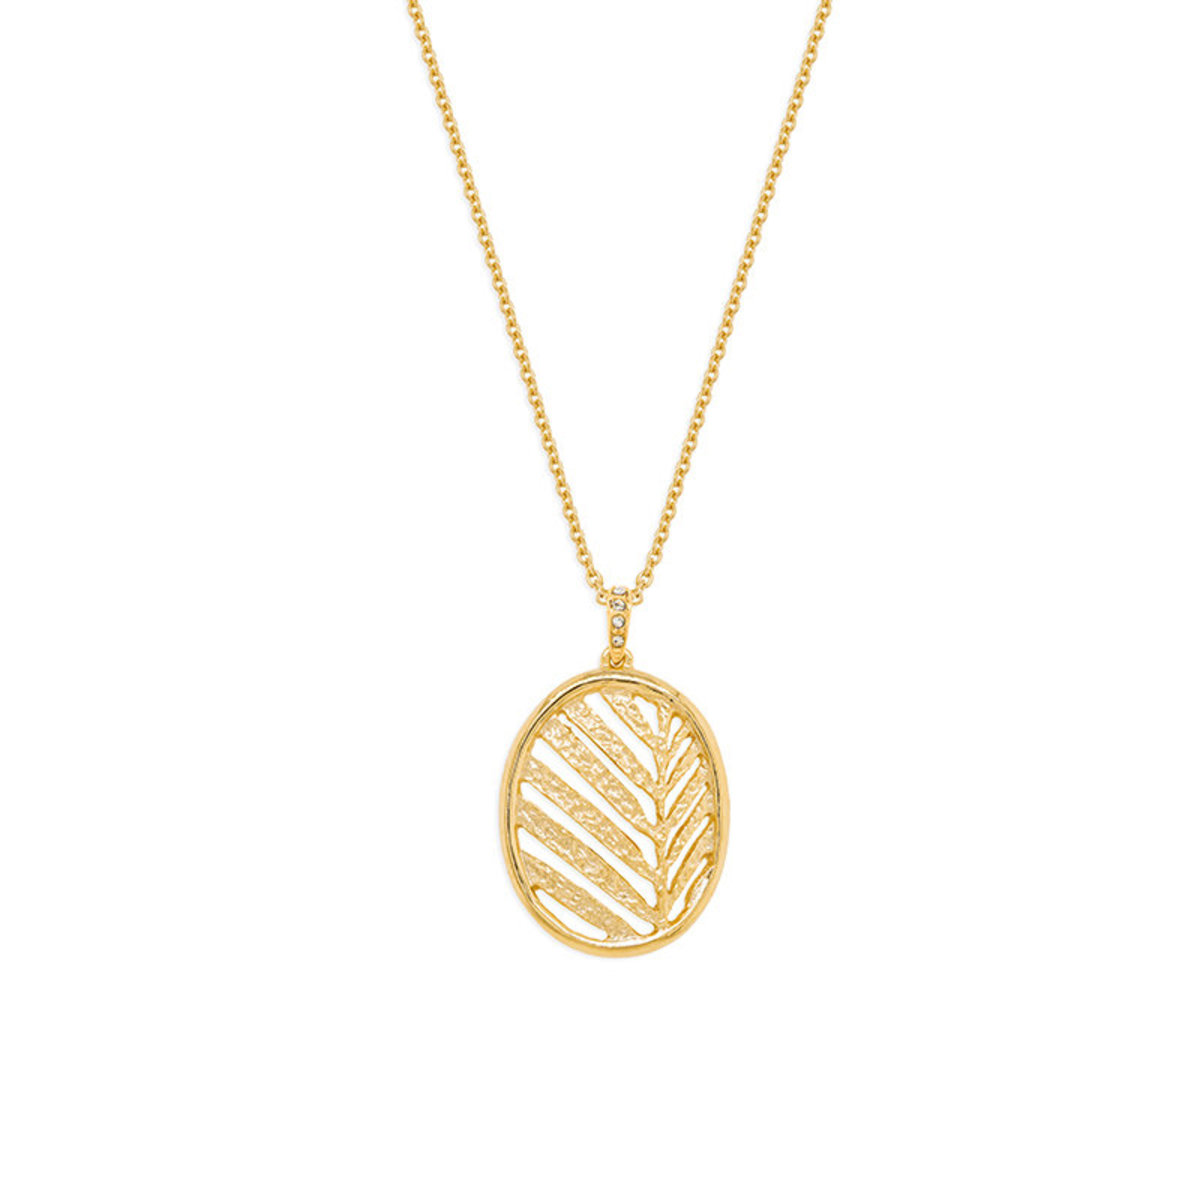 Foglia: gold plating, Swarovski crystal pendant necklace